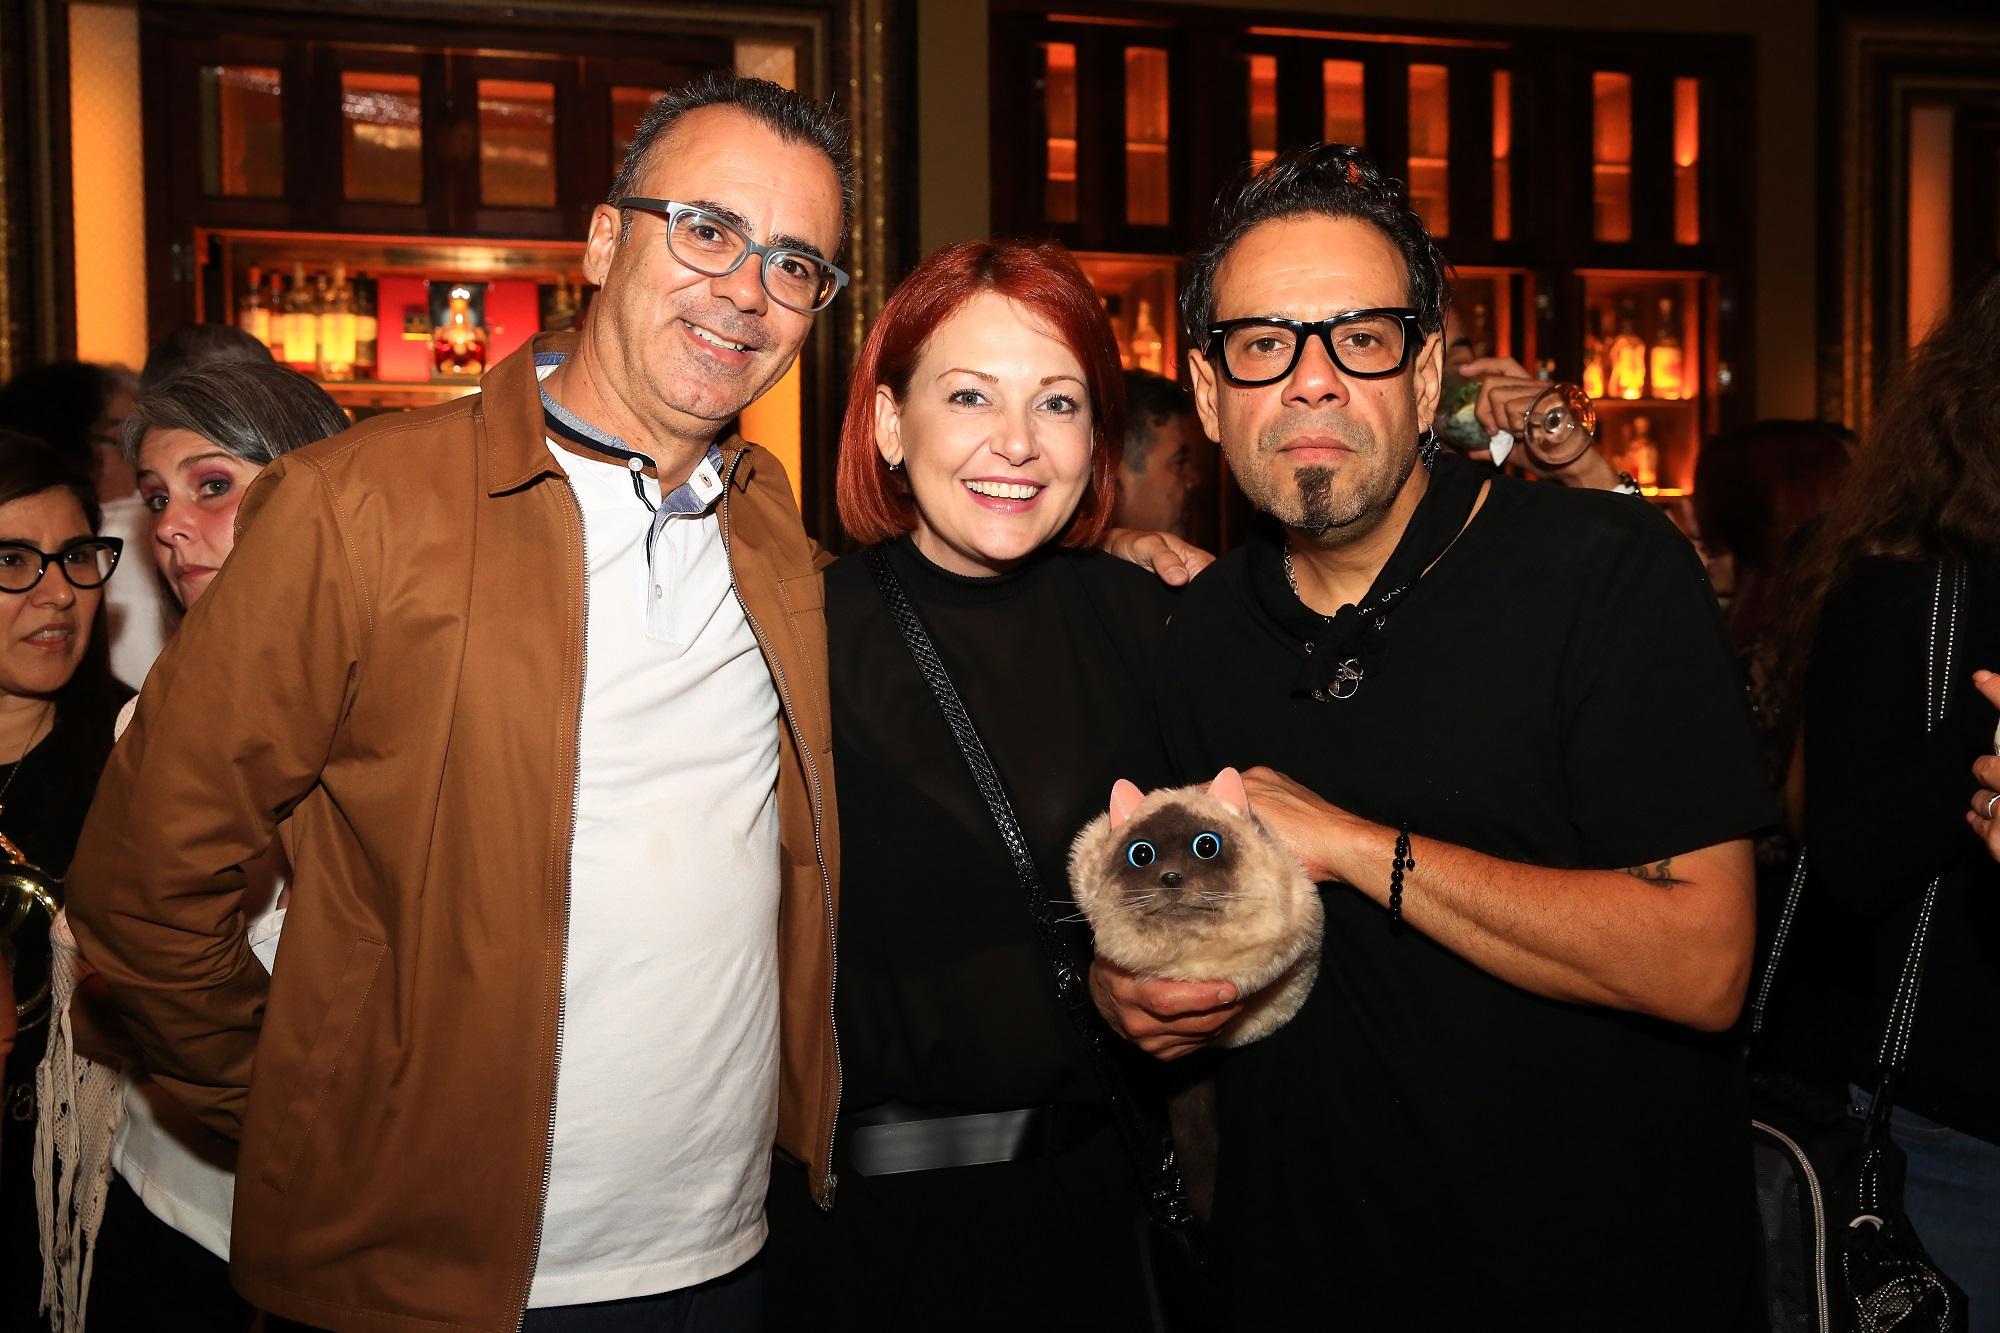 Tommy Rivera, Lorelli Navarro y Rai Torres. (Suministrada)